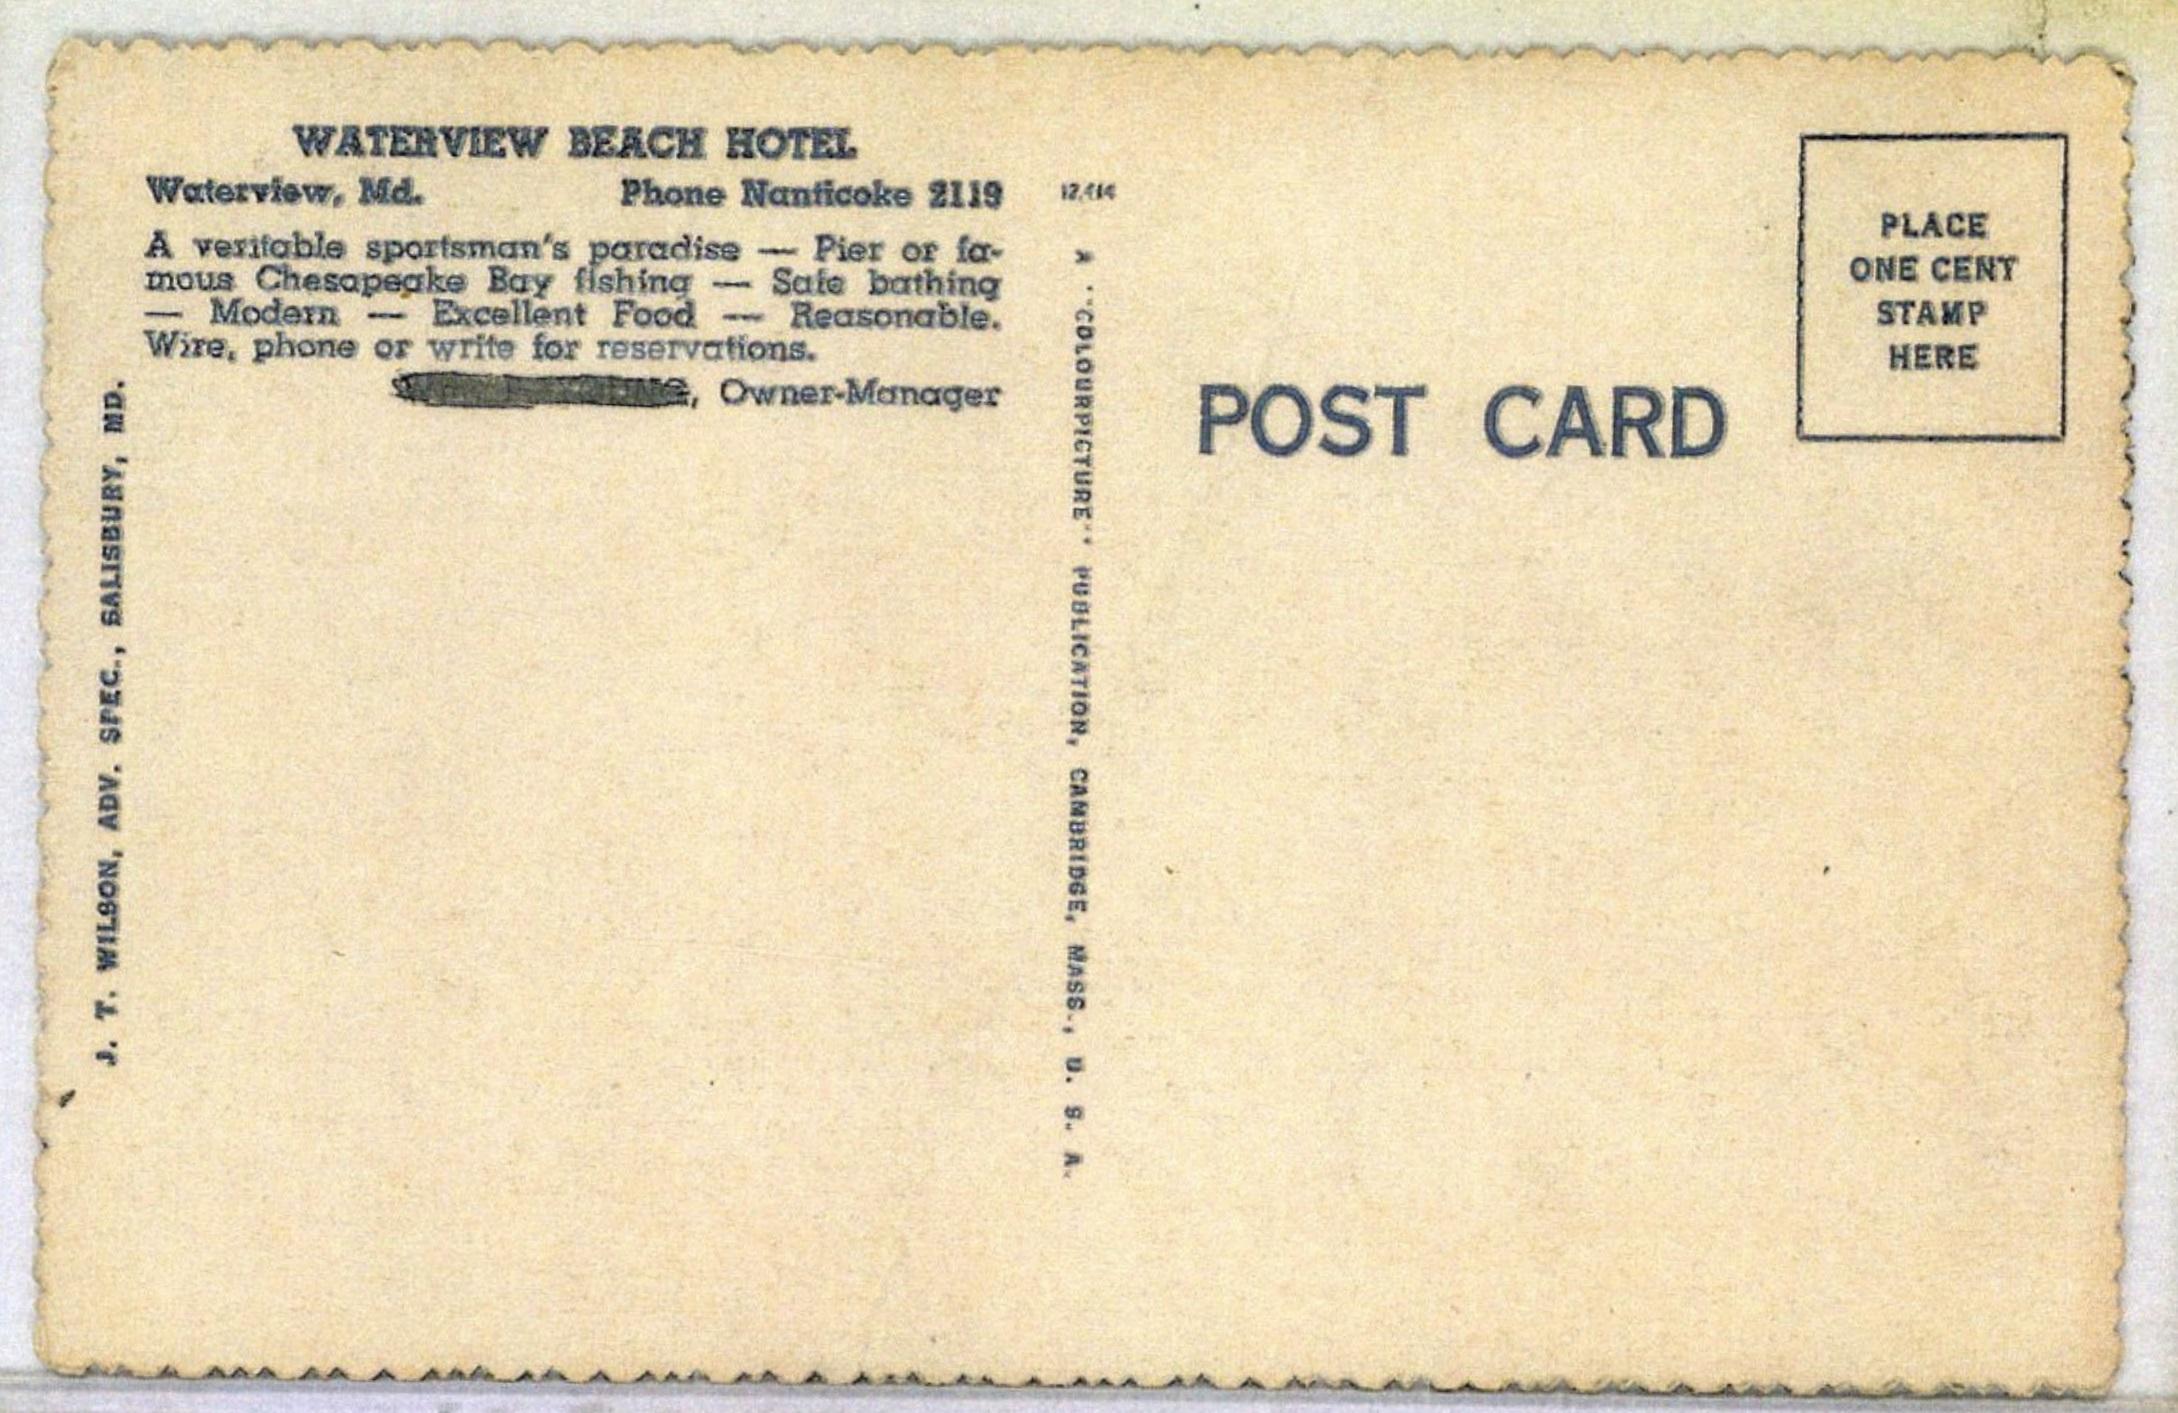 Waterview Beach Hotel Postcard